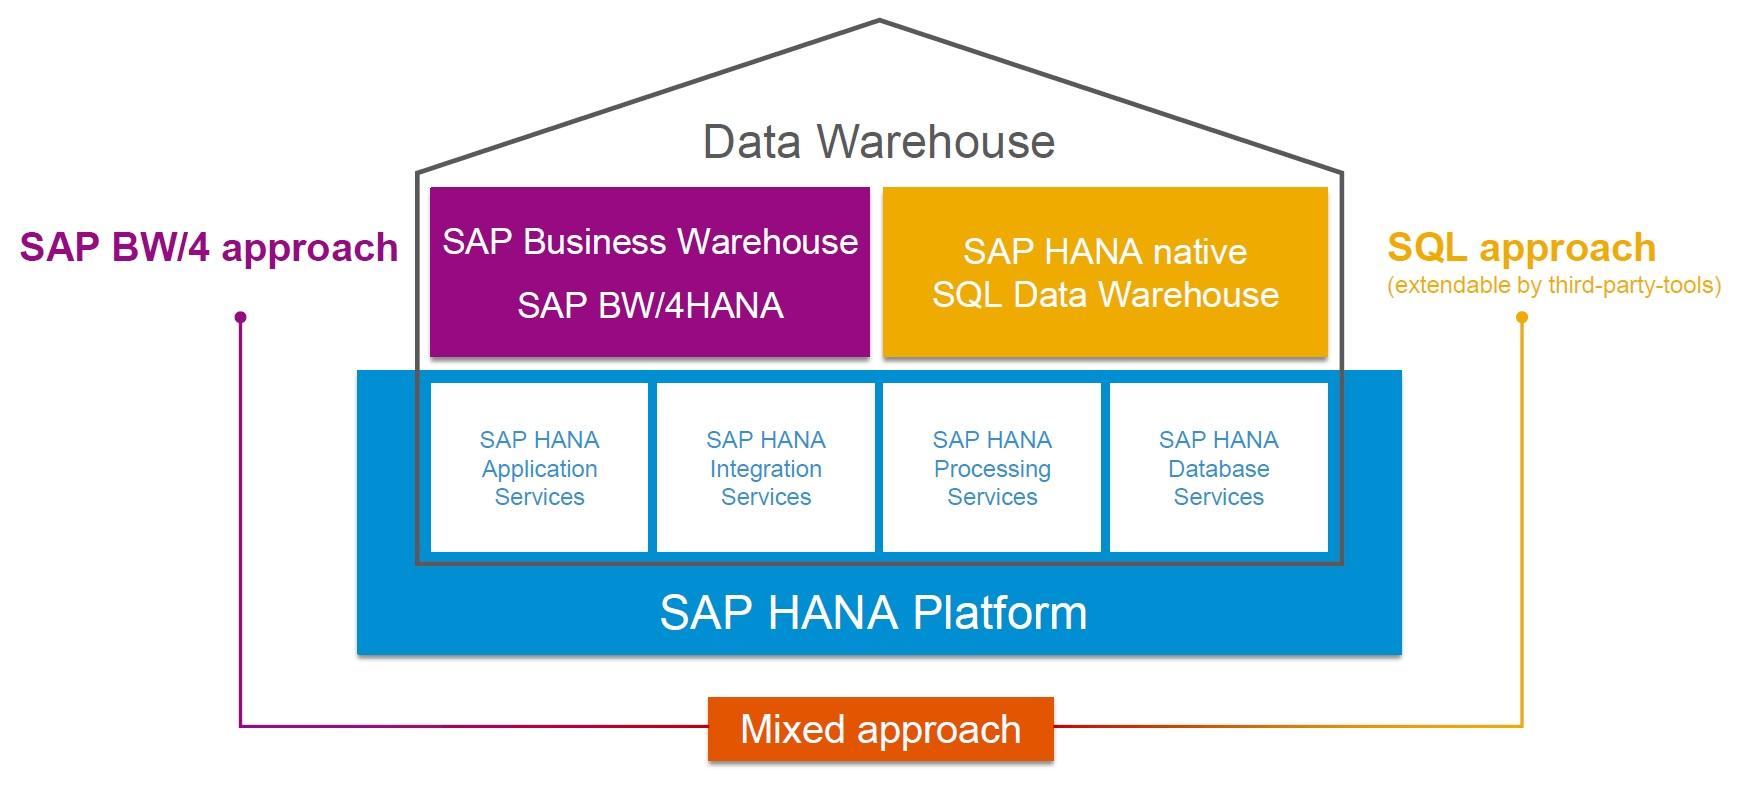 SAP BW/4HANA – Data Warehouse with Three Approach Strategy